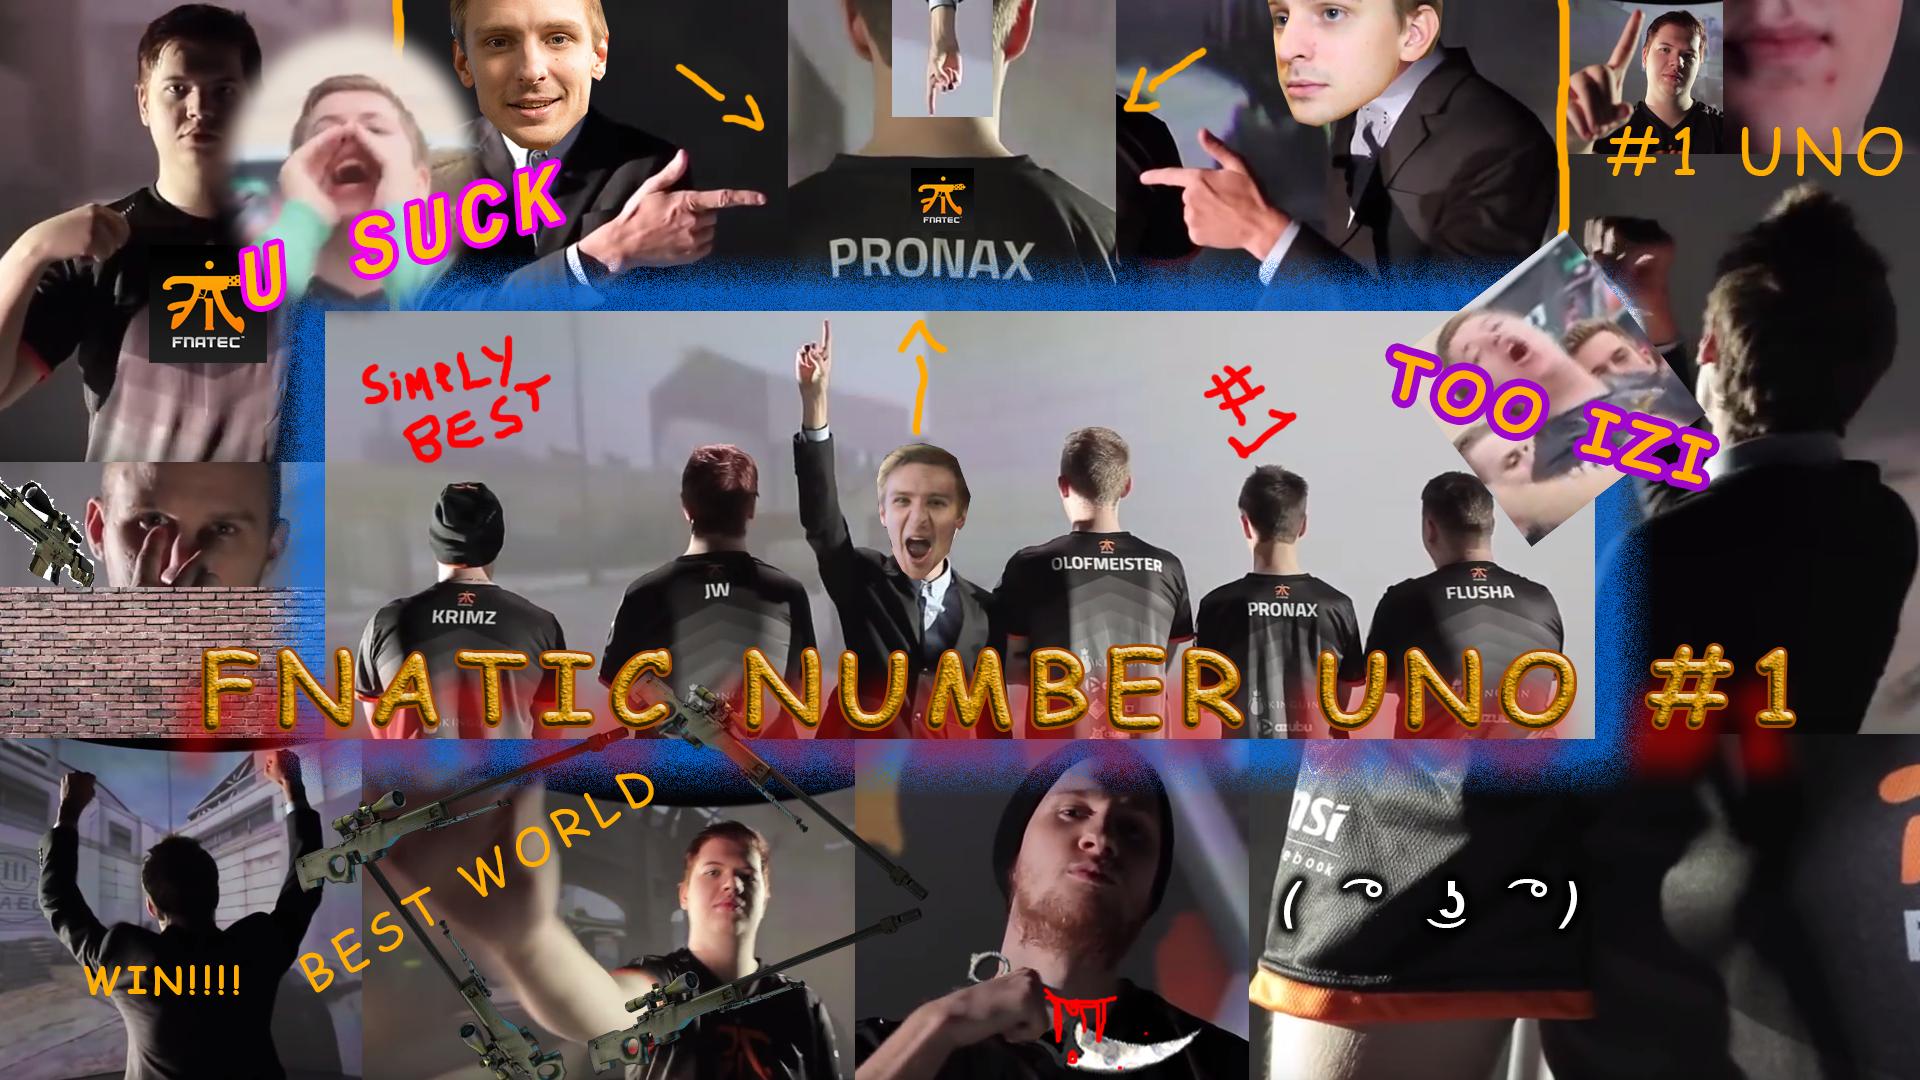 Fnatic number uno #1